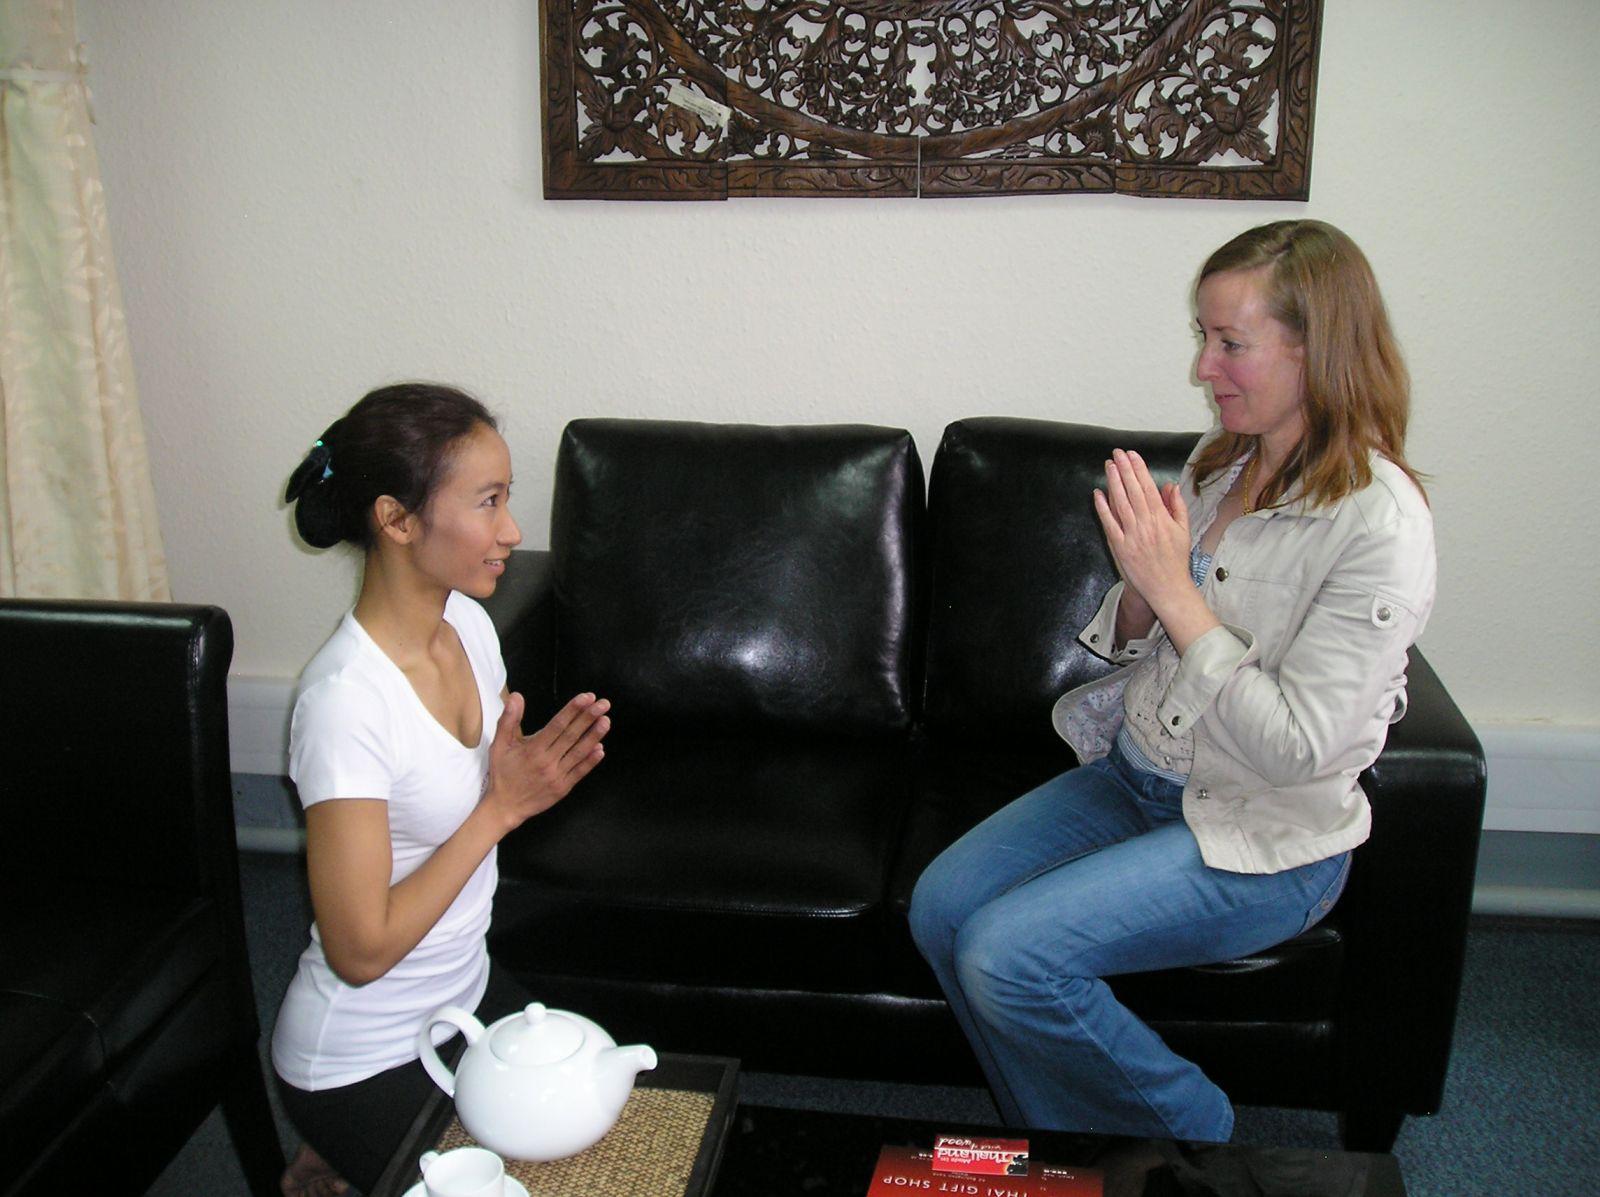 thaimassage kungsbacka erotic masage